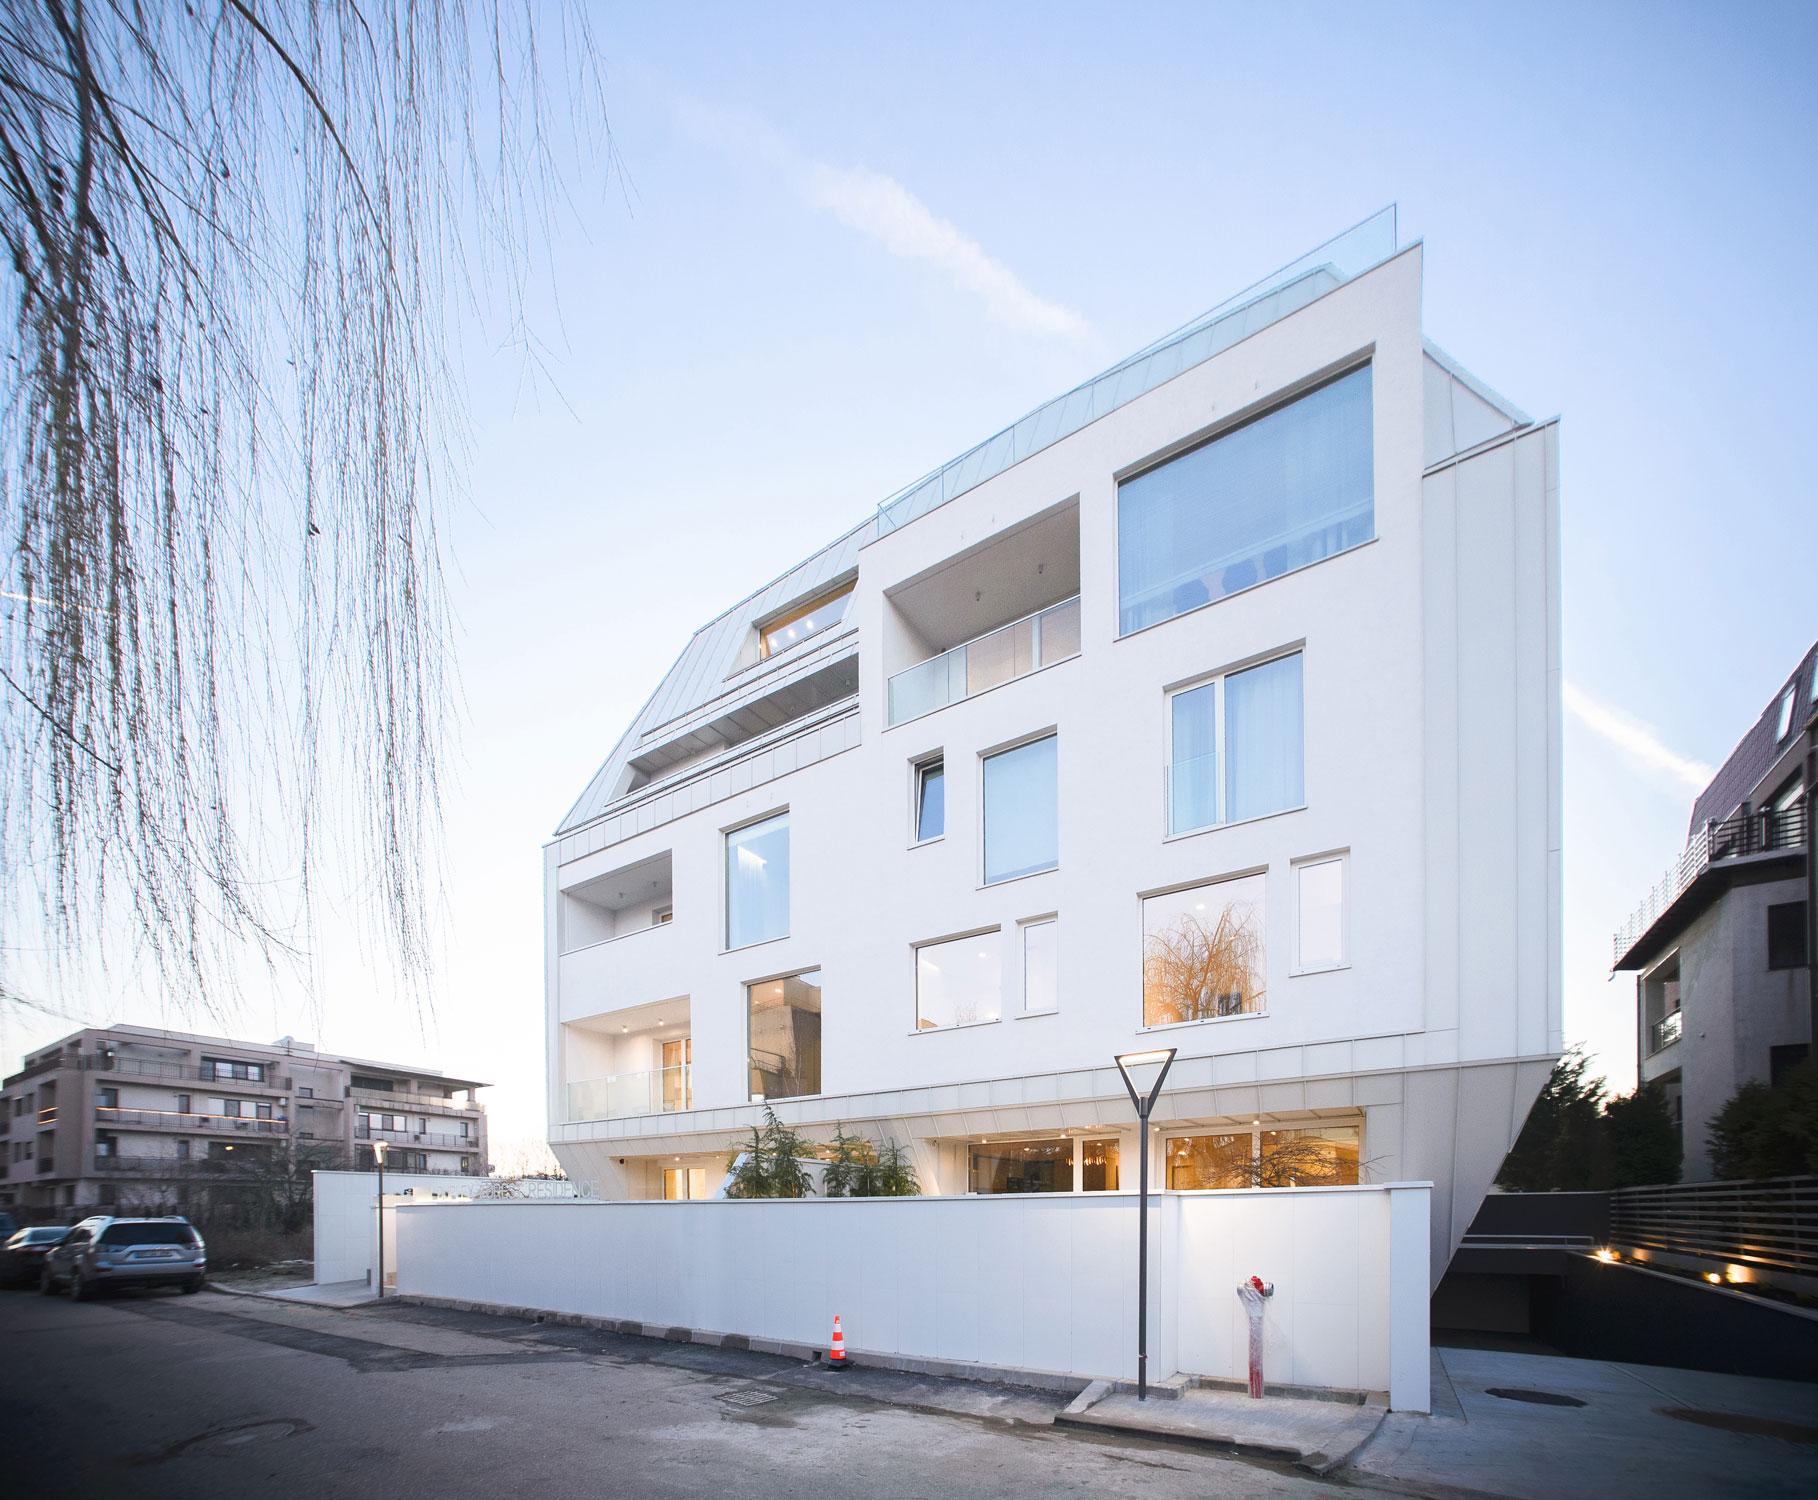 https://nbc-arhitect.ro/wp-content/uploads/2020/10/NBC-Arhitect-_-residential-_-Duplex-Forest-Residence-_-Romania_43.jpg